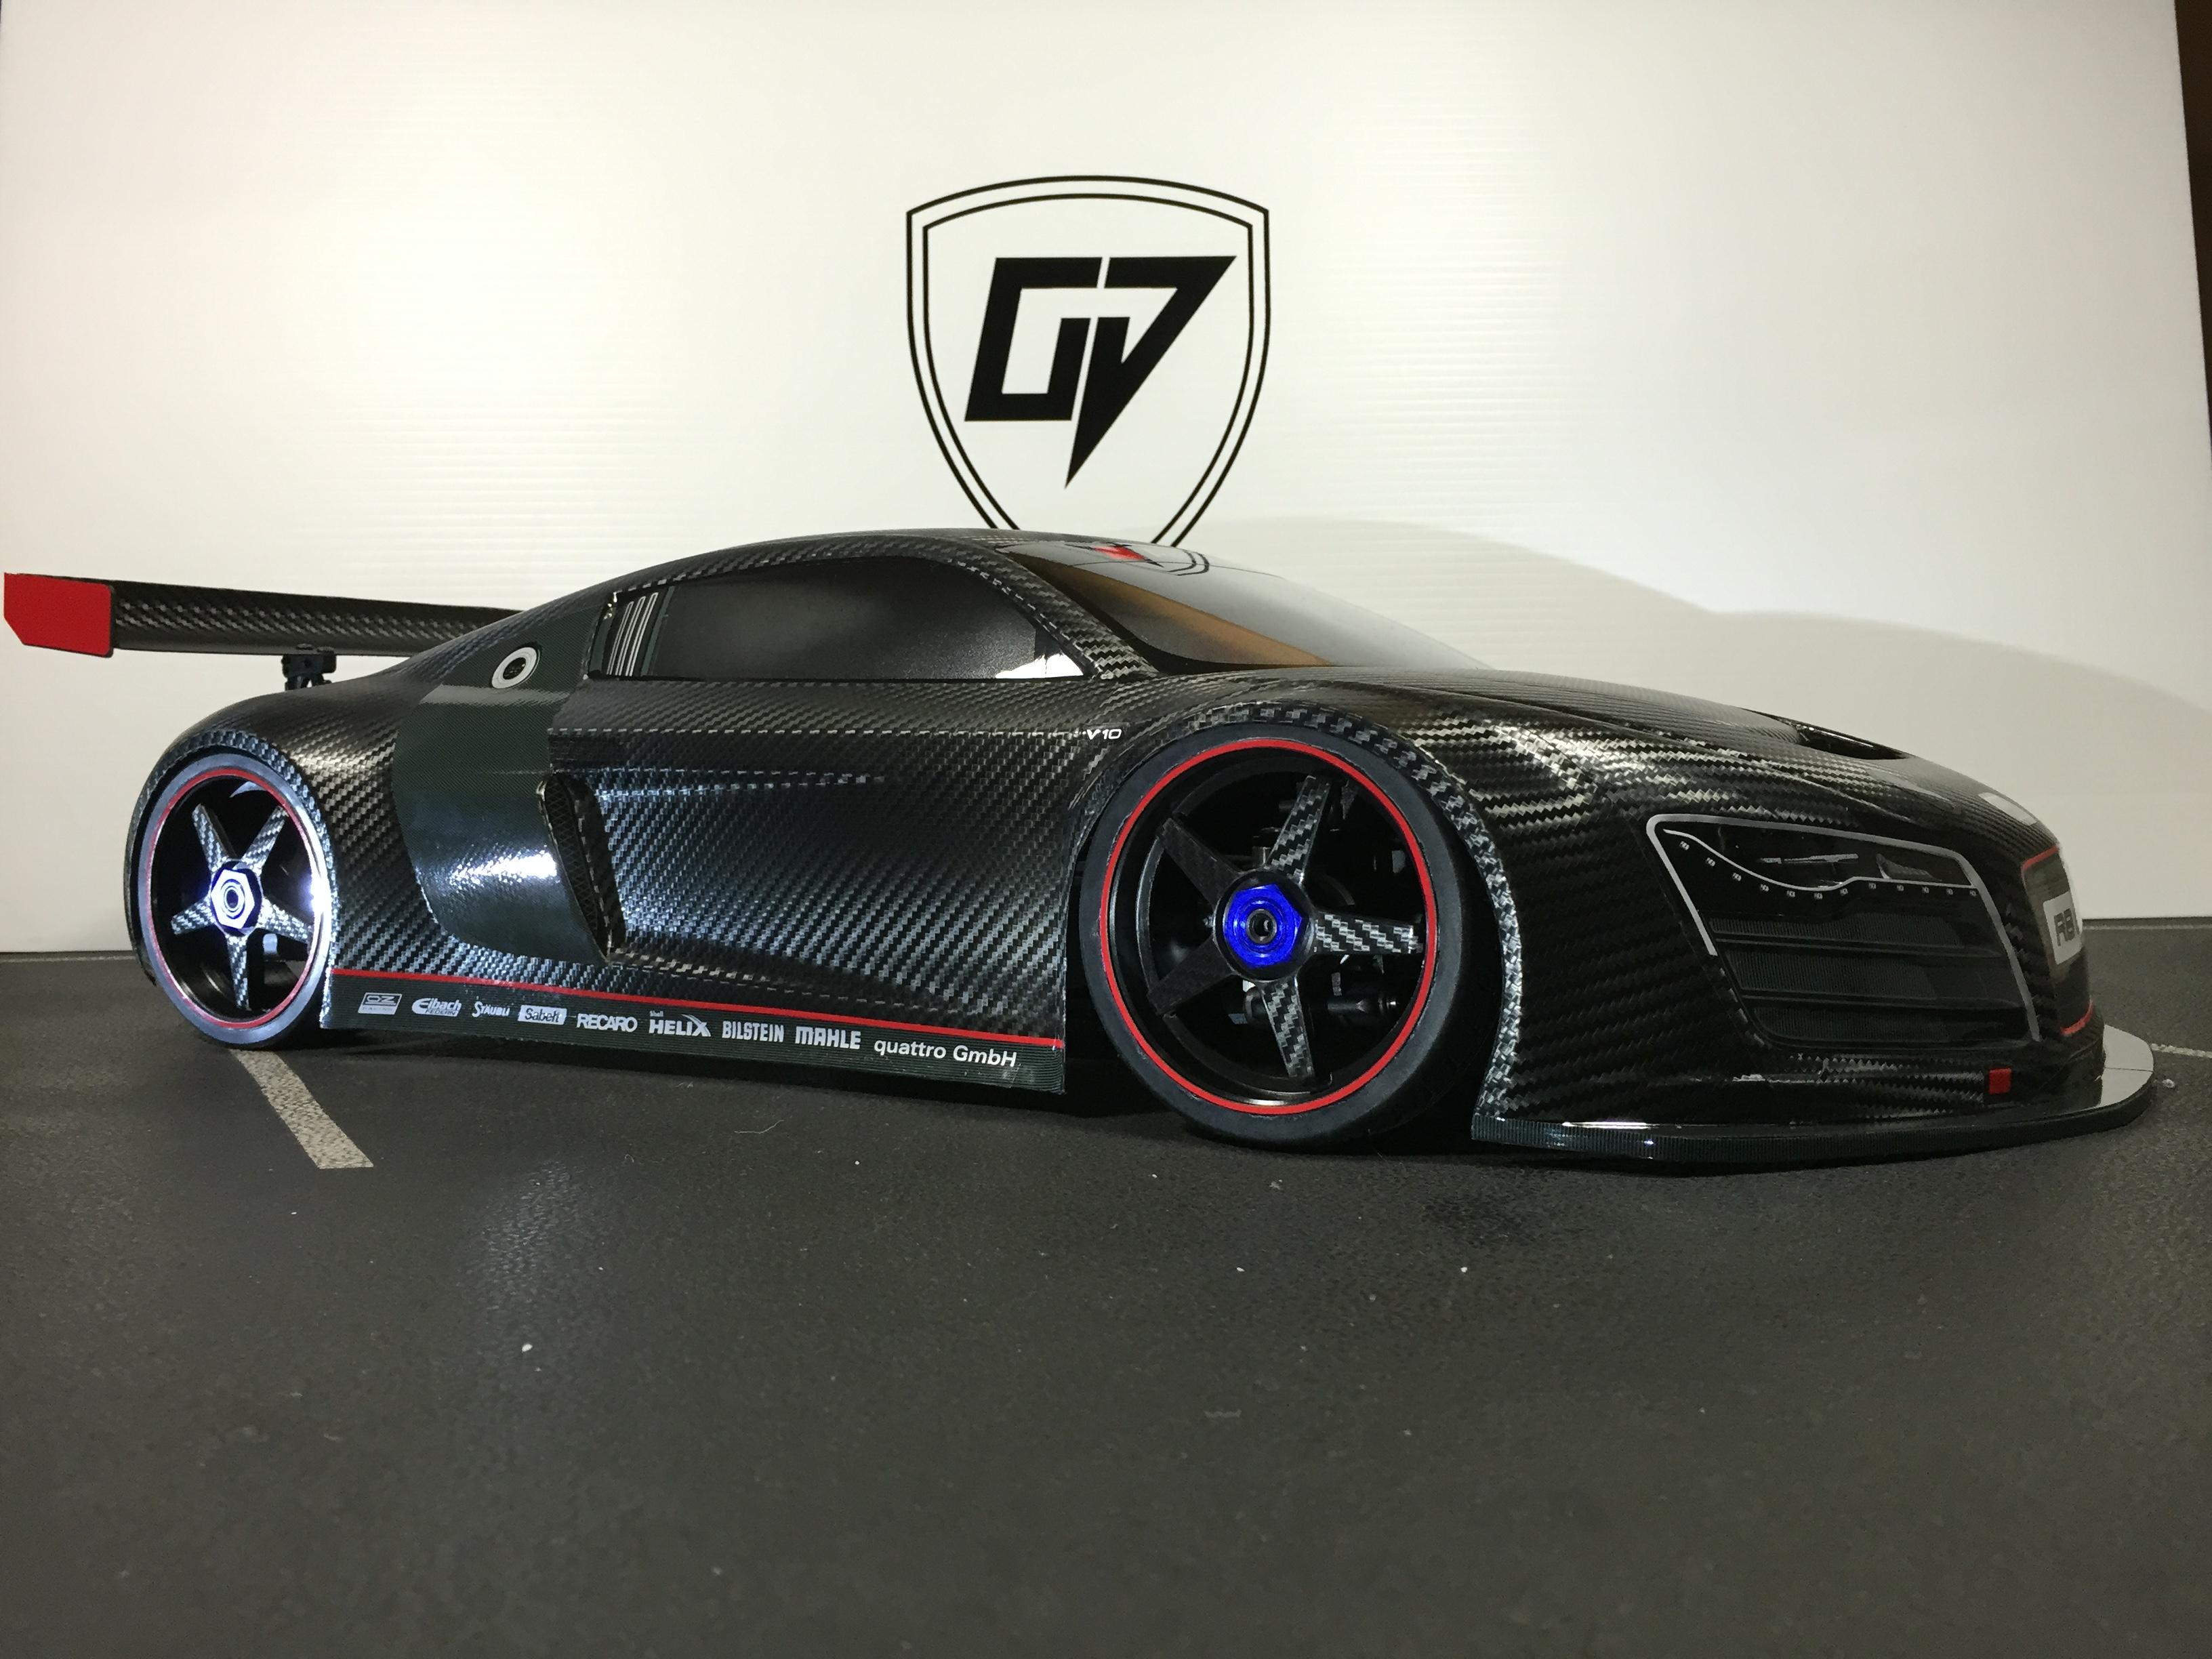 Kyosko Audi GT2 Audi R8  Oakman Designs